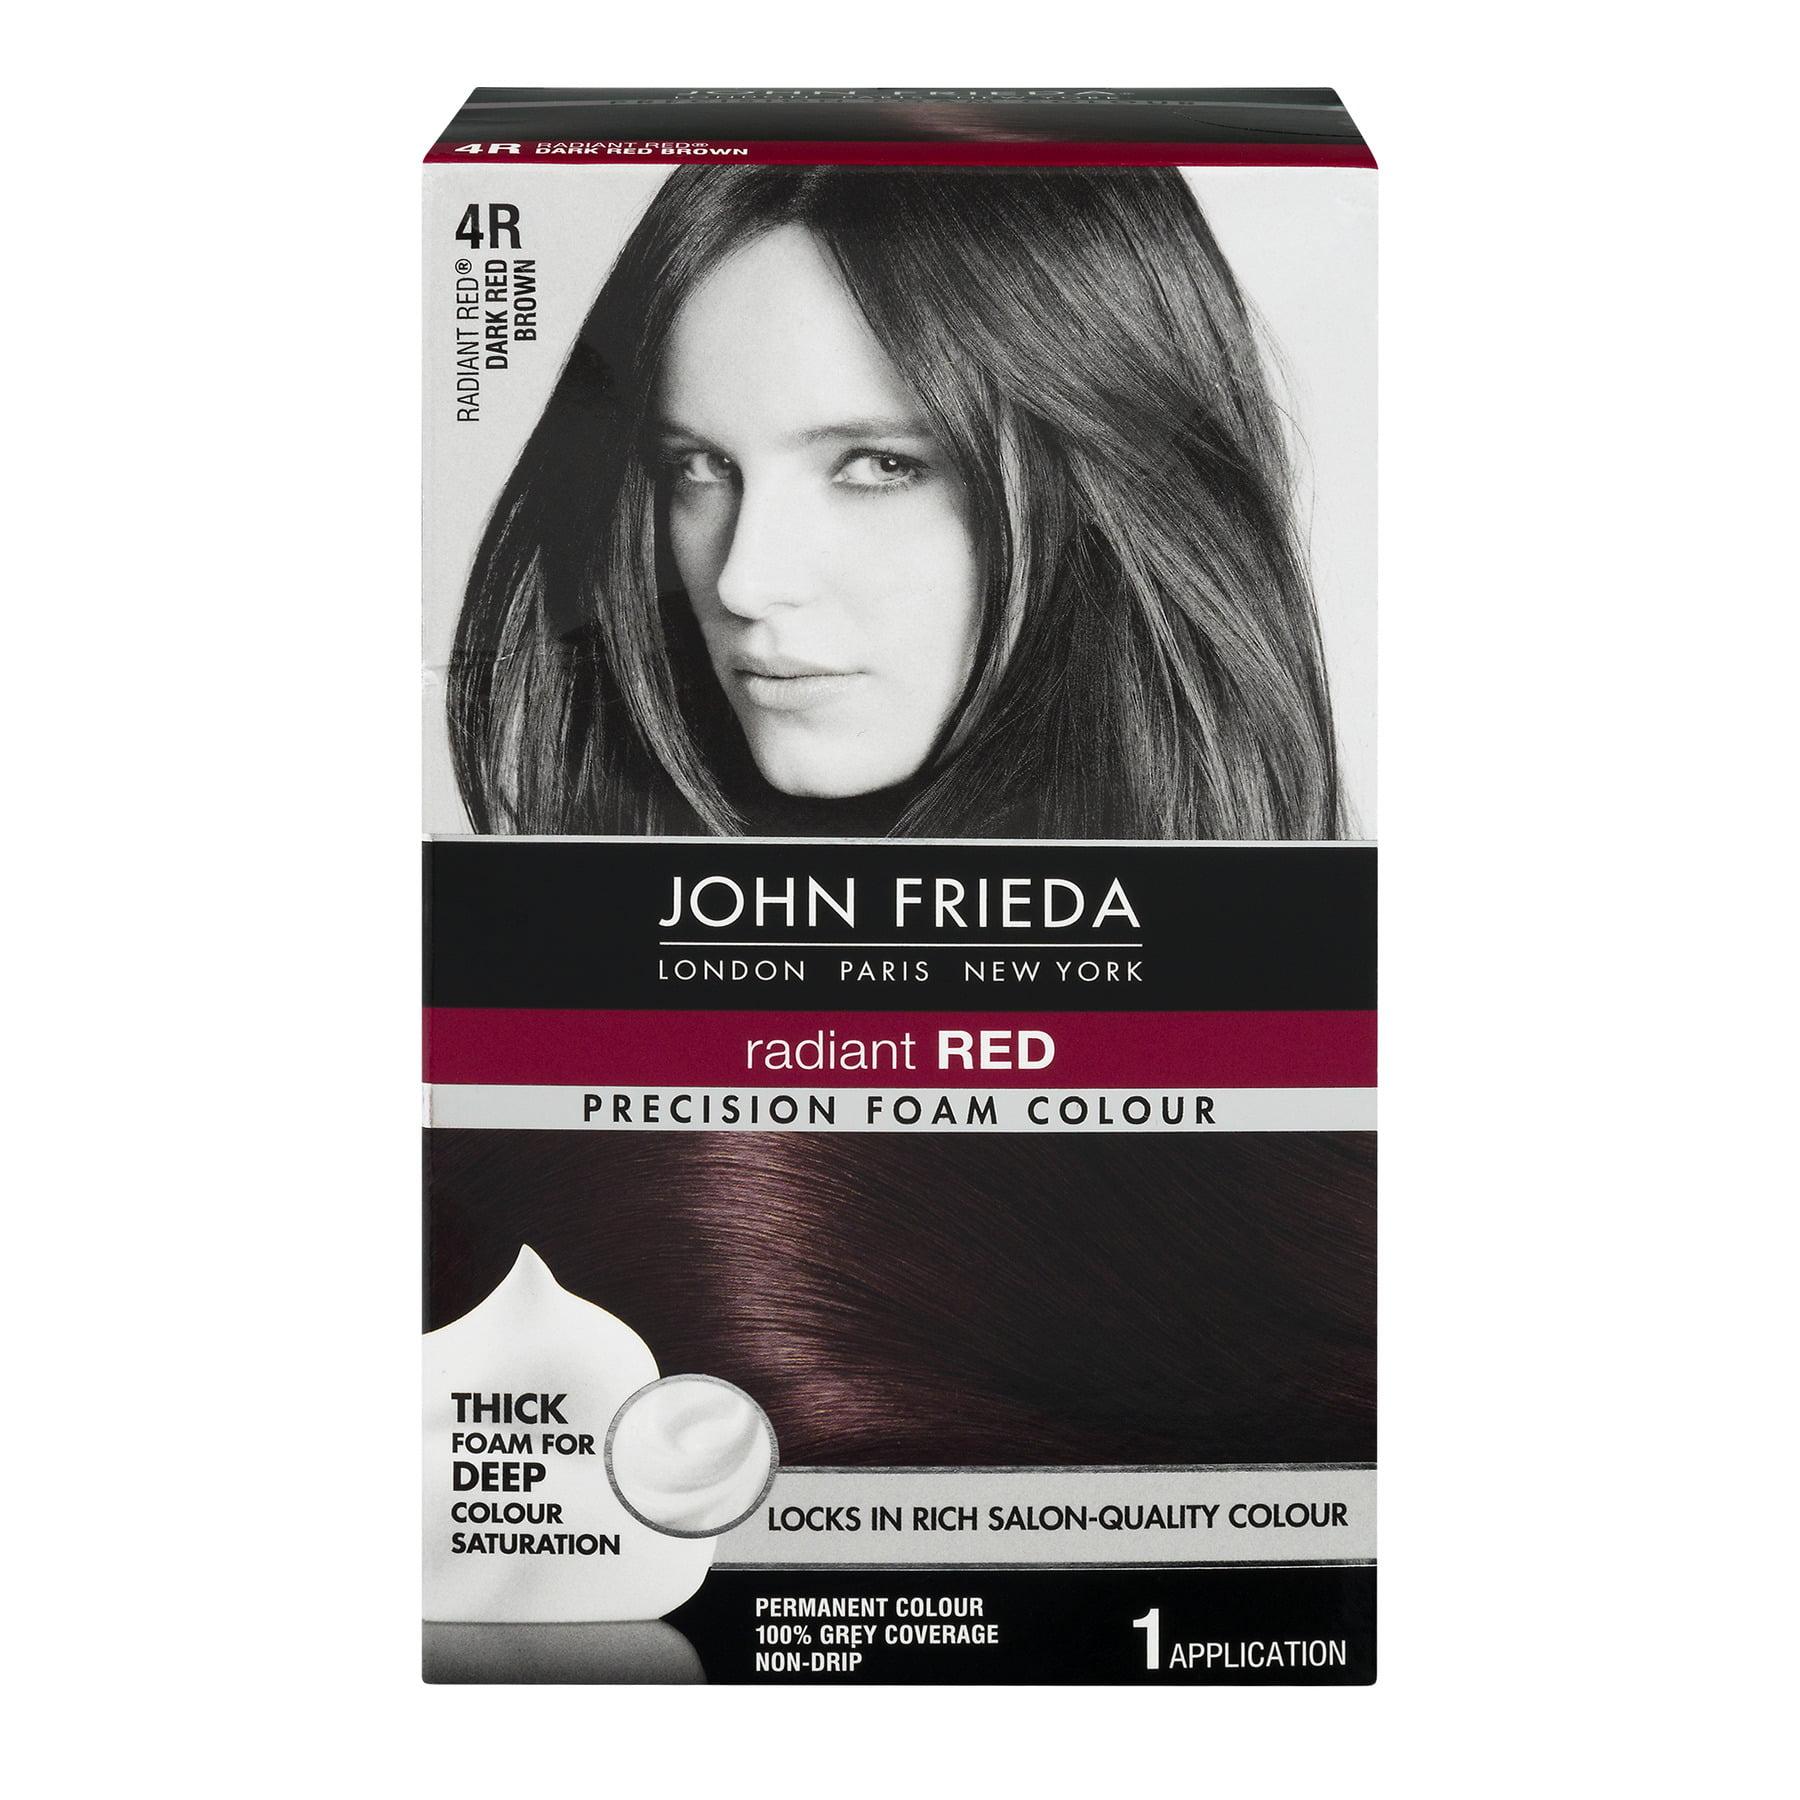 John Frieda Radiant Red 4r Dark Red Brown Precision Foam Colour 1